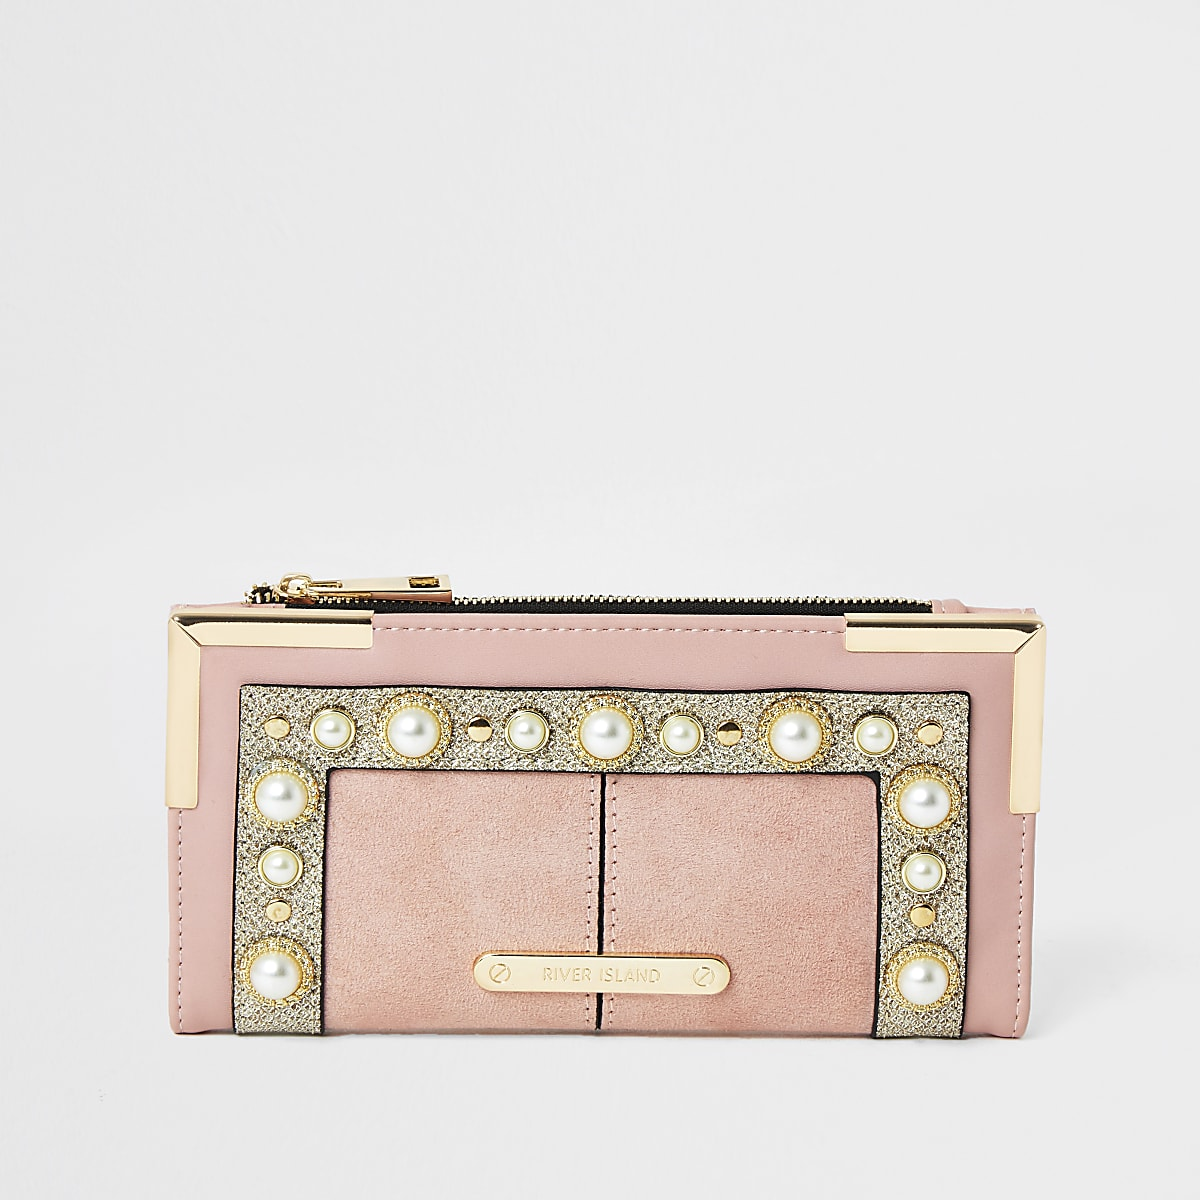 Roze uitvouwbare portemonnee met parels verfraaid